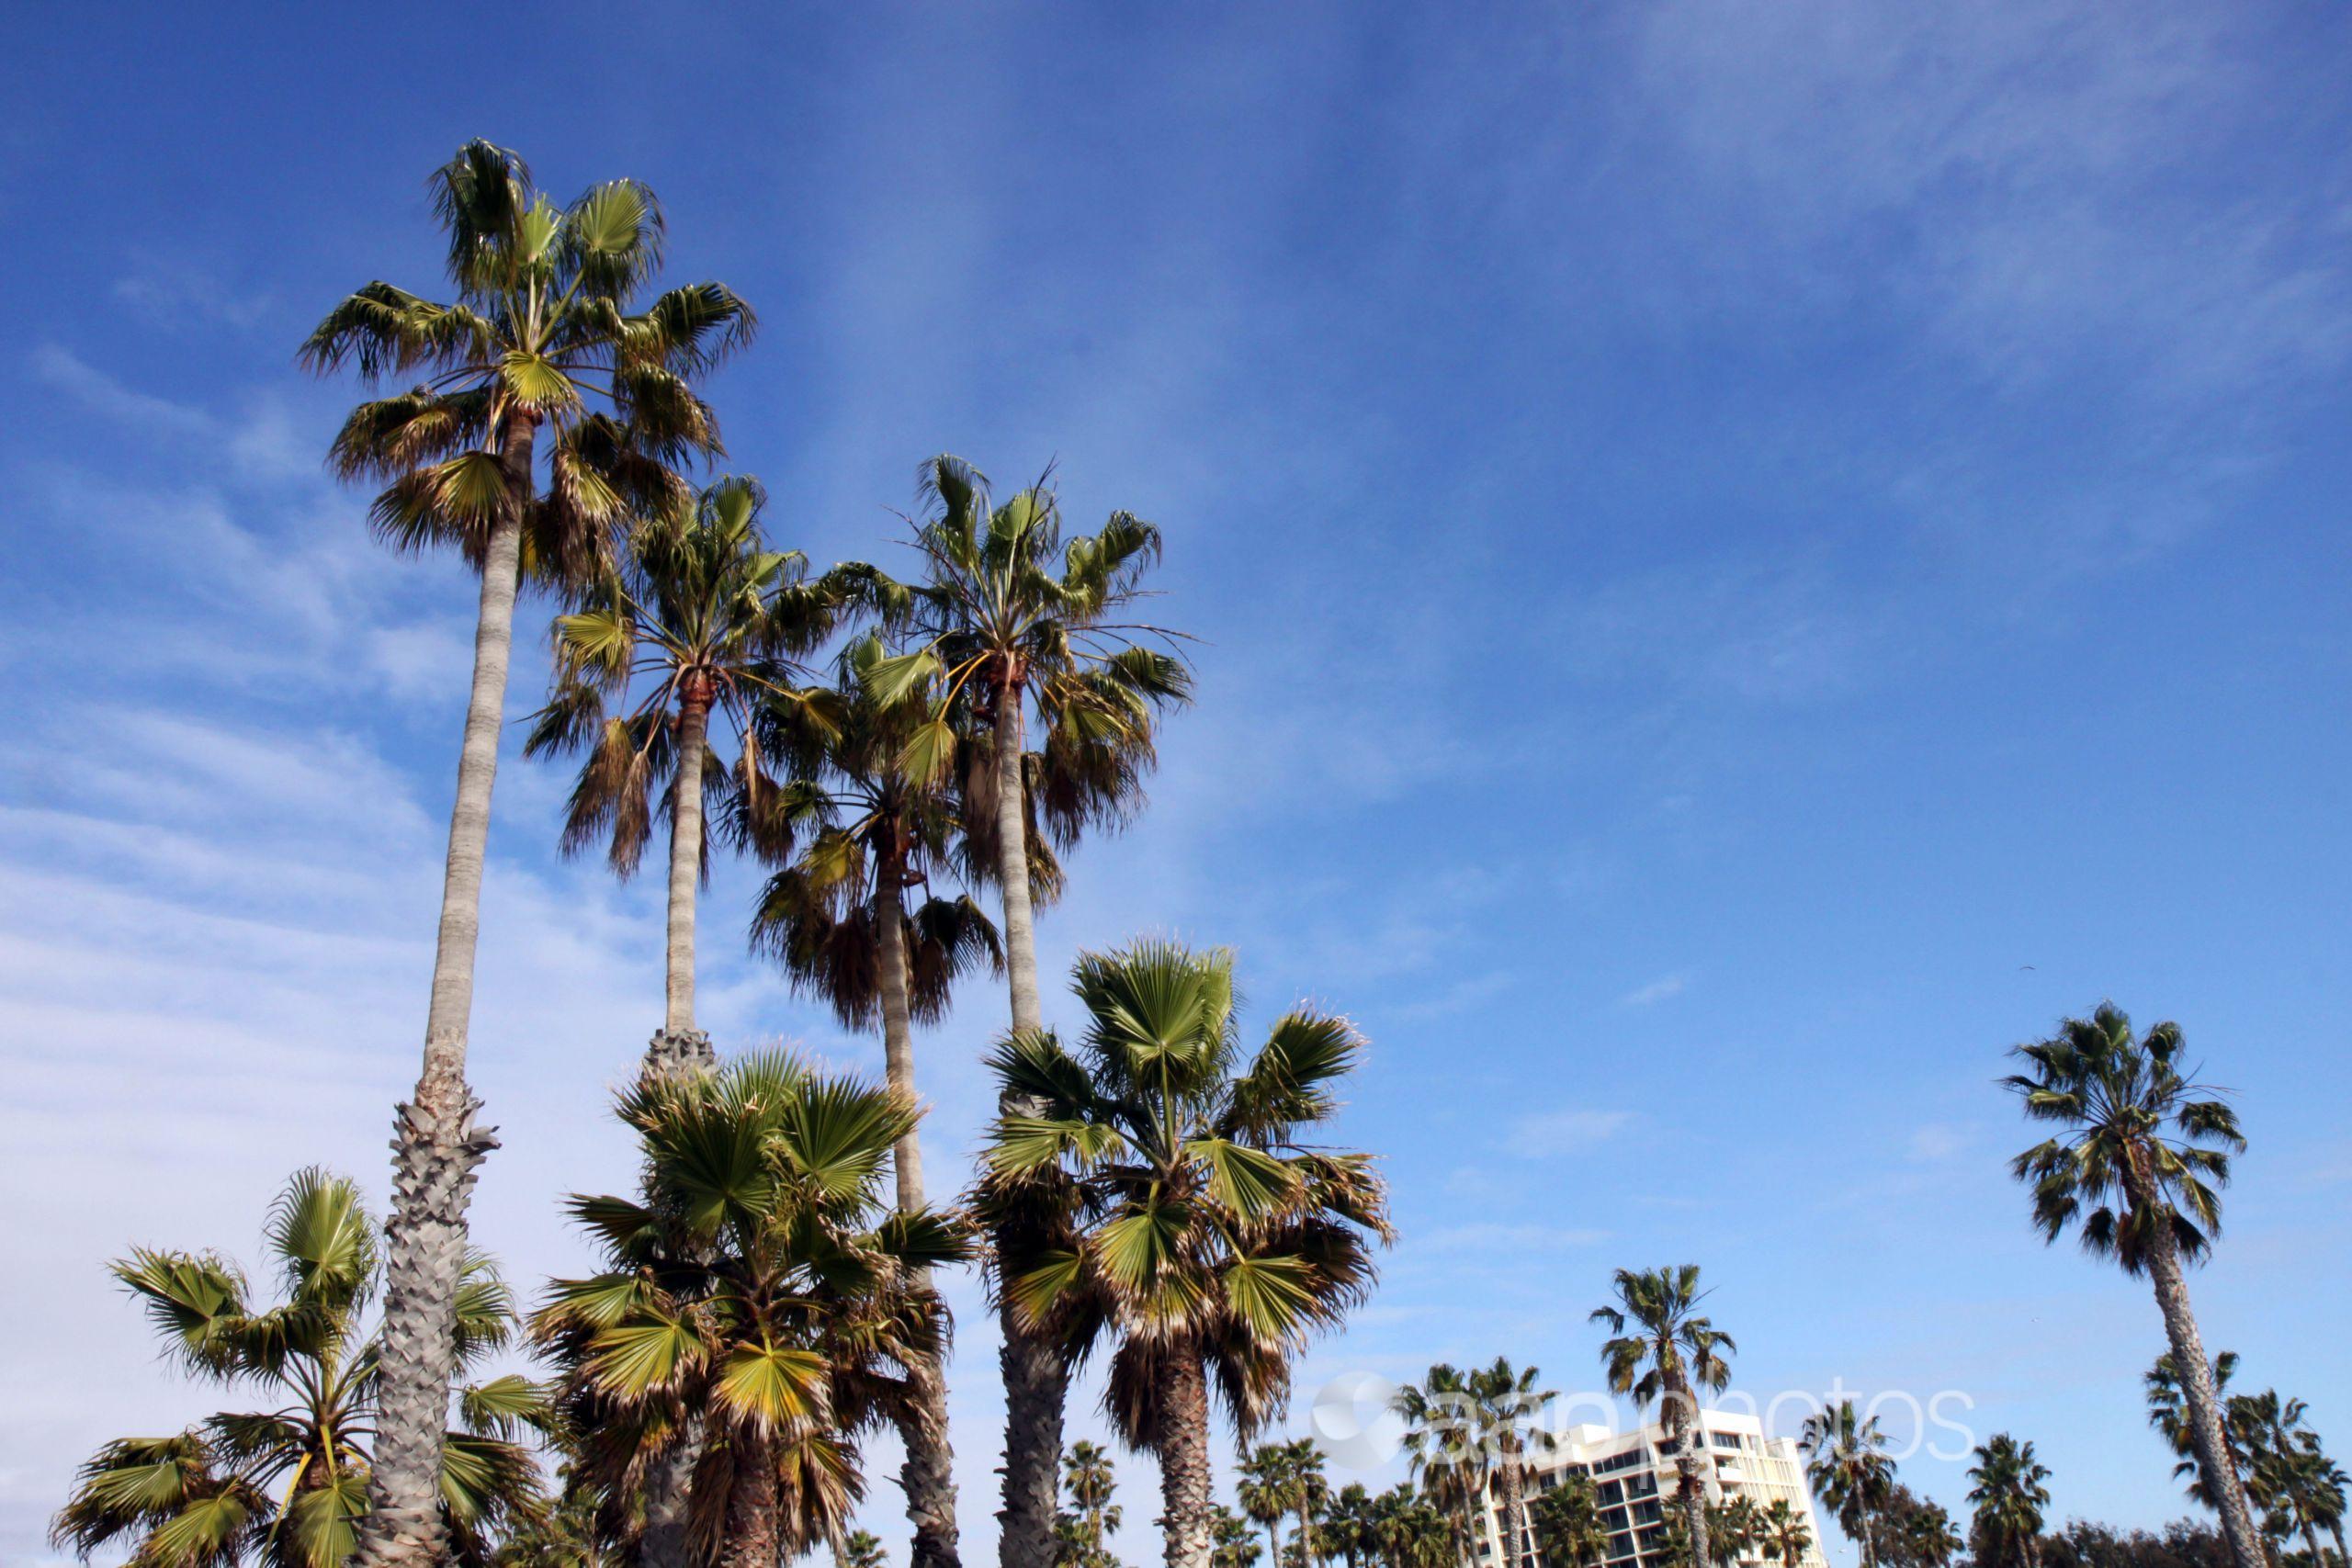 Palm trees along the Santa Monica Boulevard, Santa Monica, USA.